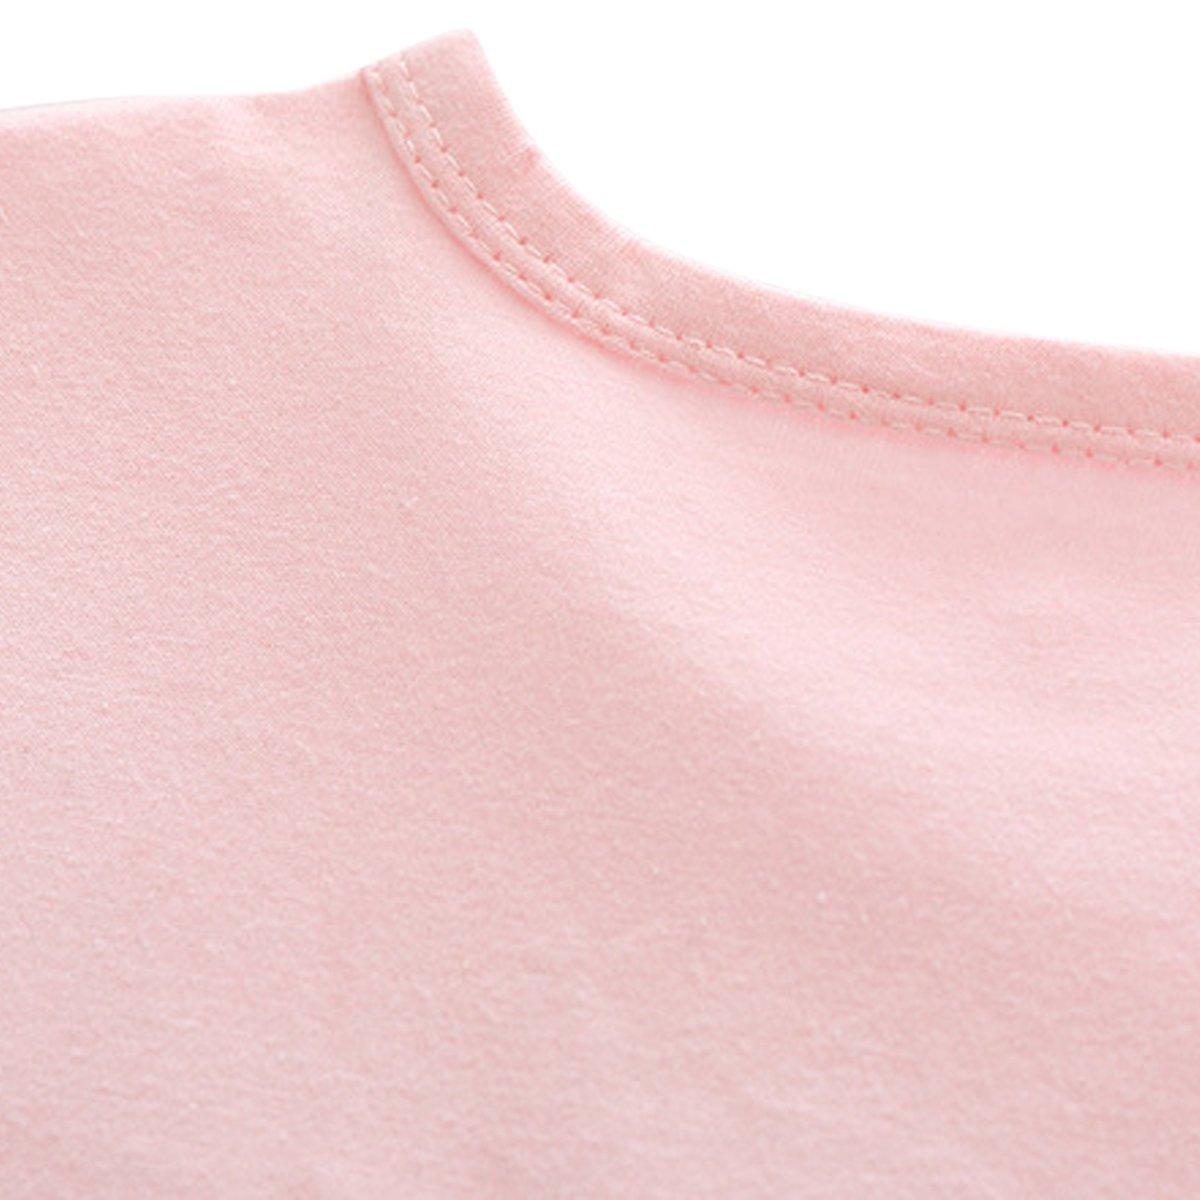 Kanodan Baby Girl Dress Romper Summer Sleeveless Tutu Bodysuit Lace Ruffle 0-12M